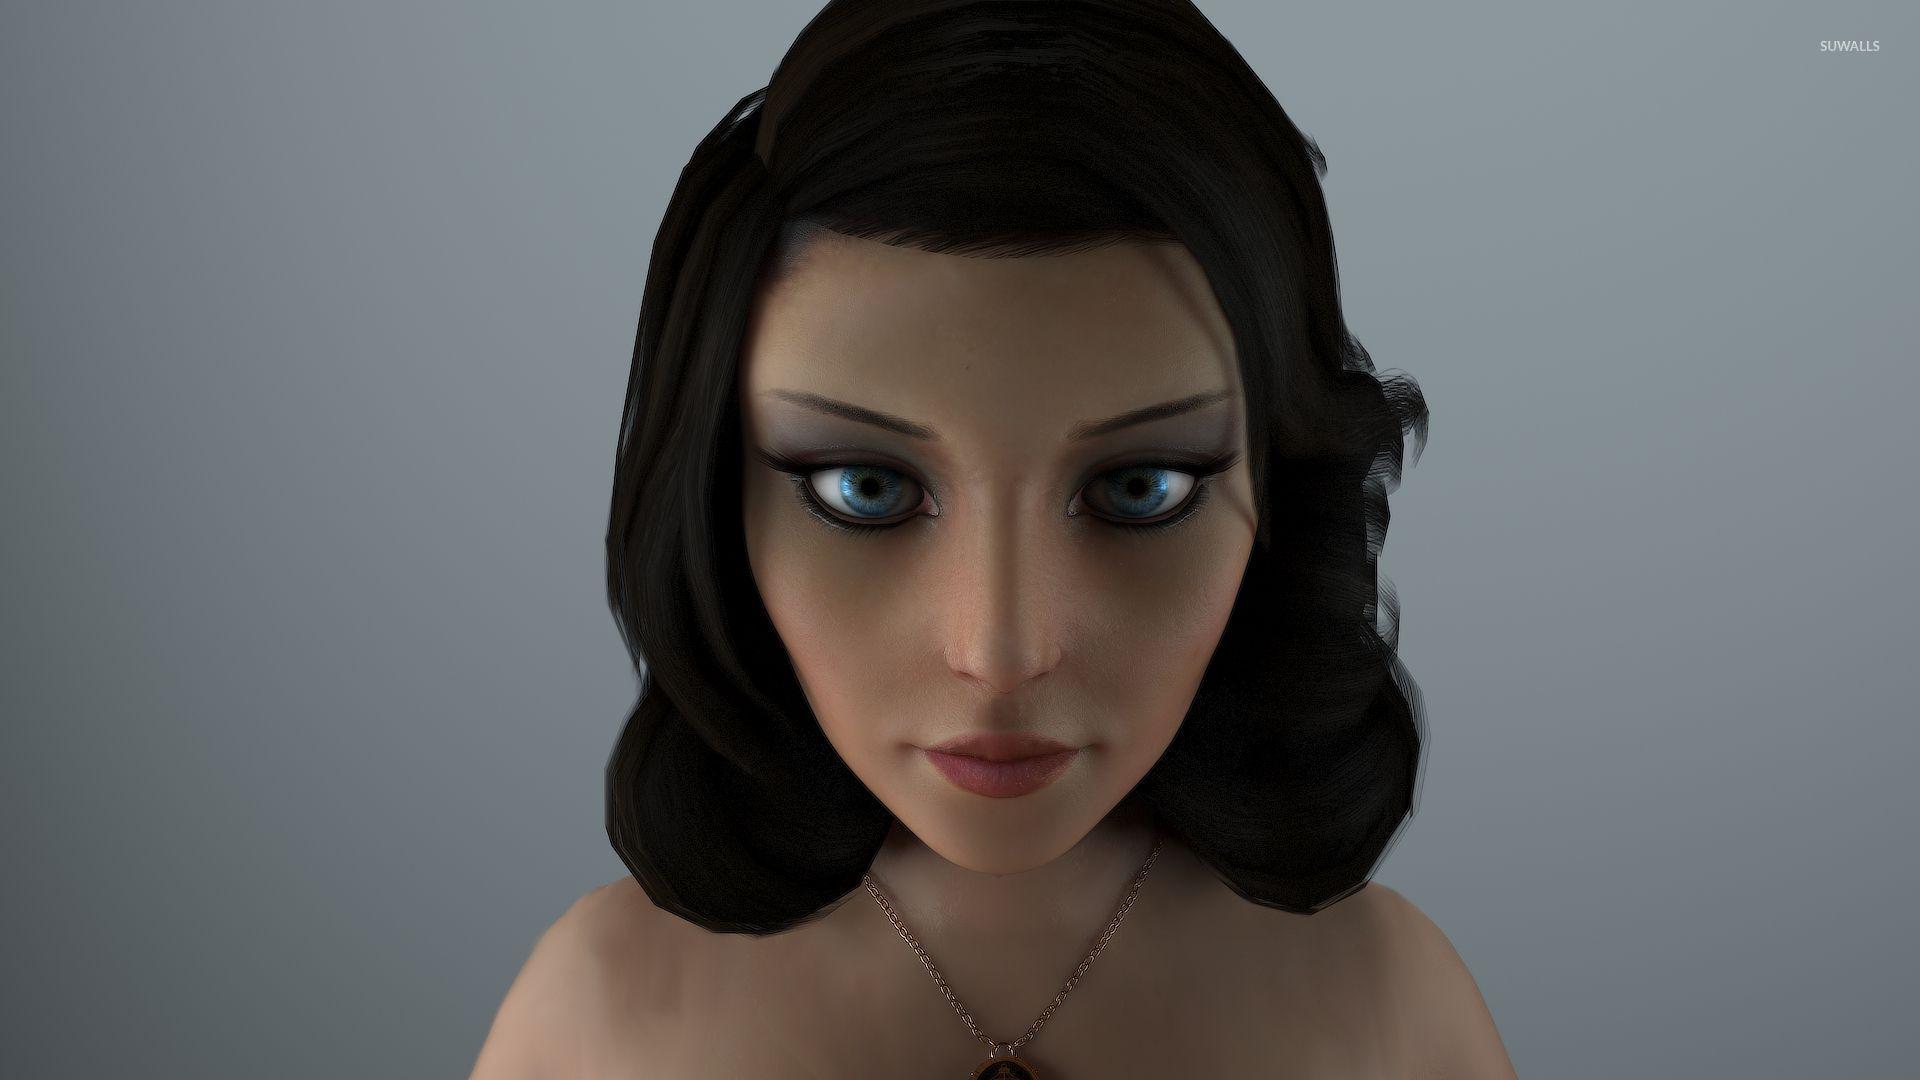 Games Bioshock Infinite Elizabeth 1920x1080 Jpg